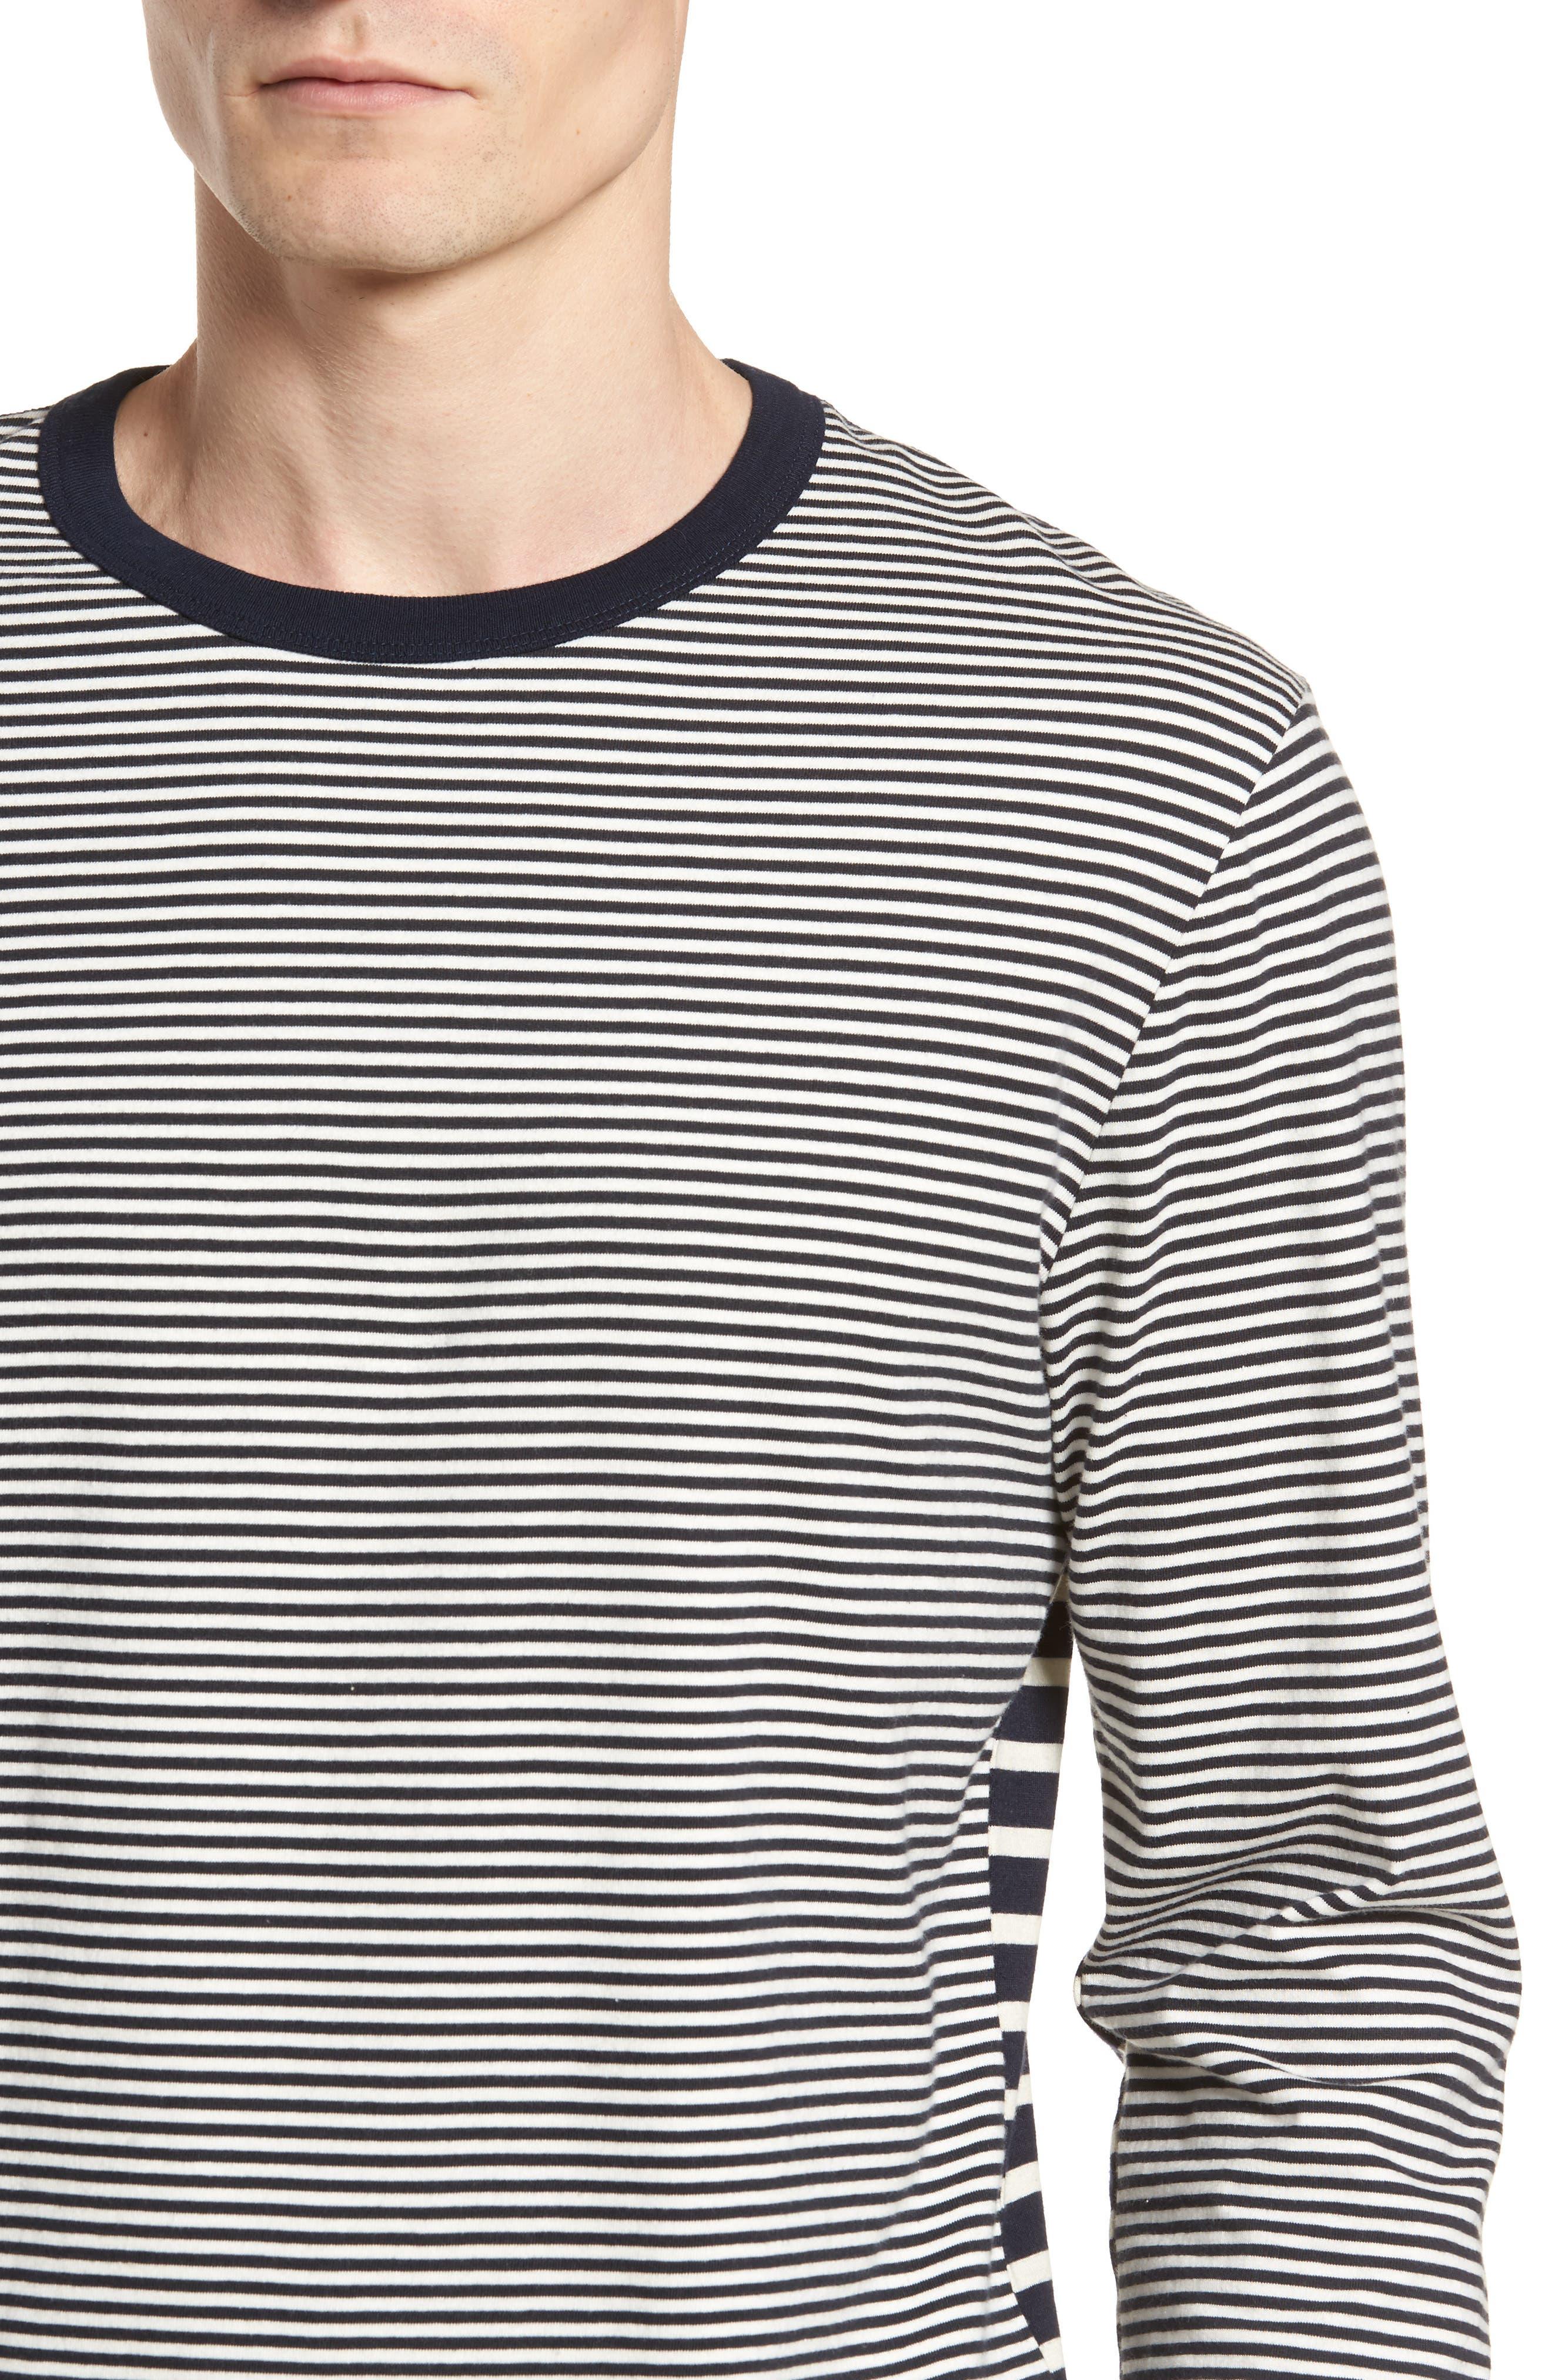 Mix Stripe Long Sleeve T-Shirt,                             Alternate thumbnail 3, color,                             Turtle Dove/ Marine Blue